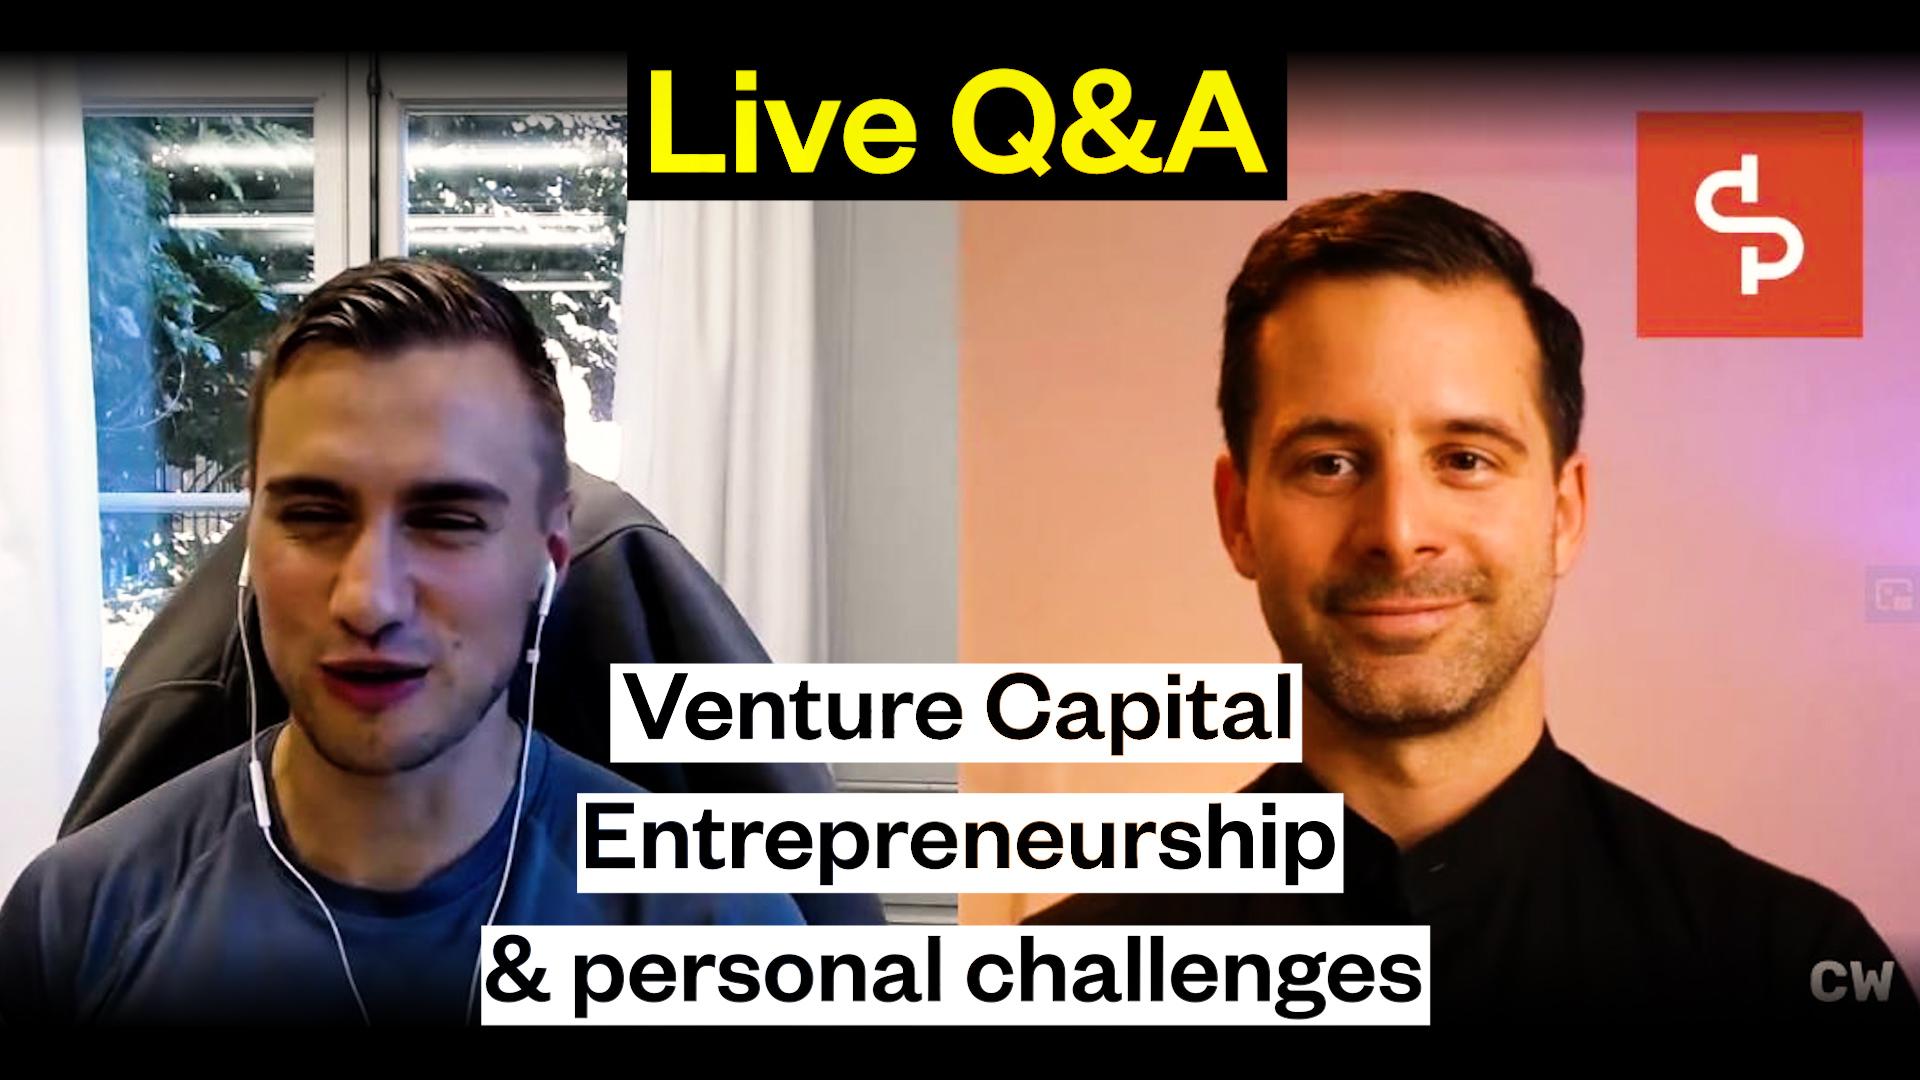 Swisspreneur: Live Q&A with Silvan Krähenbühl & Cédric Waldburger